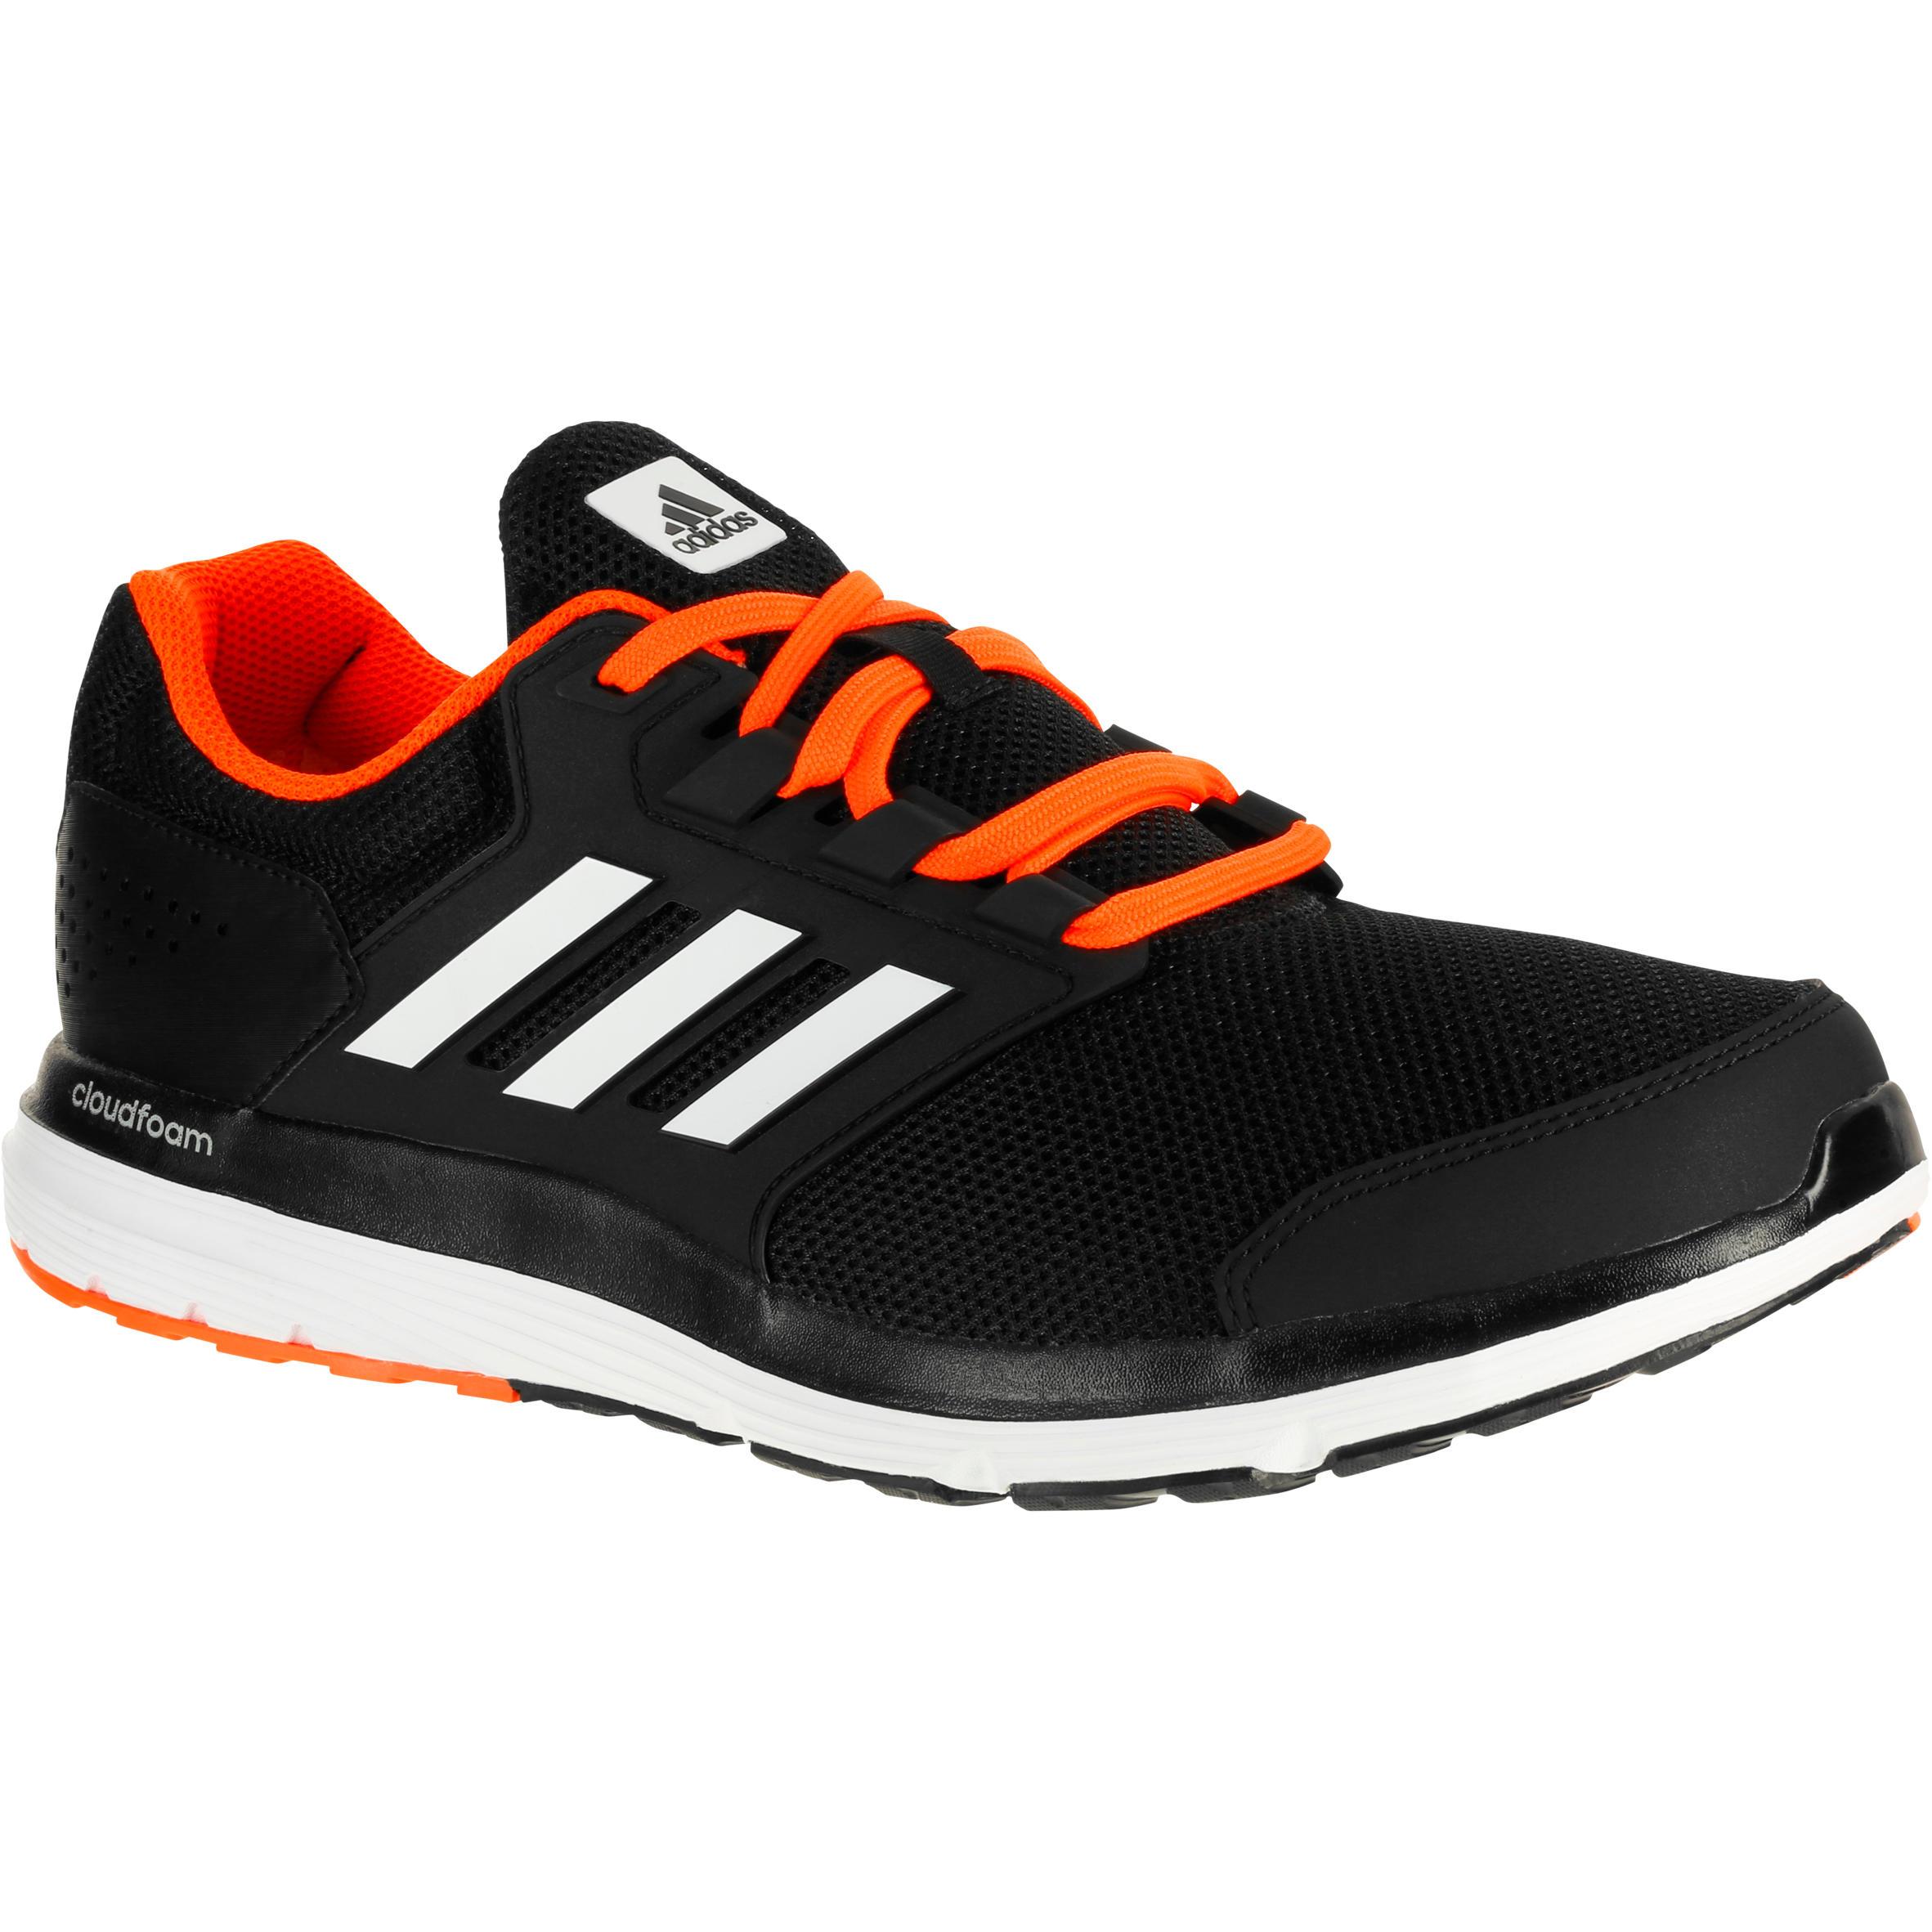 adidas chaussures jogging adidas galaxy 4 homme noir decathlon. Black Bedroom Furniture Sets. Home Design Ideas